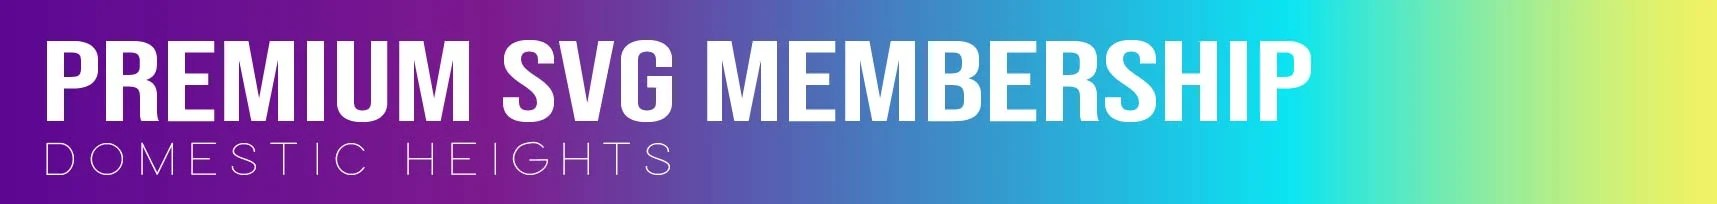 DH SVG Membership Logo